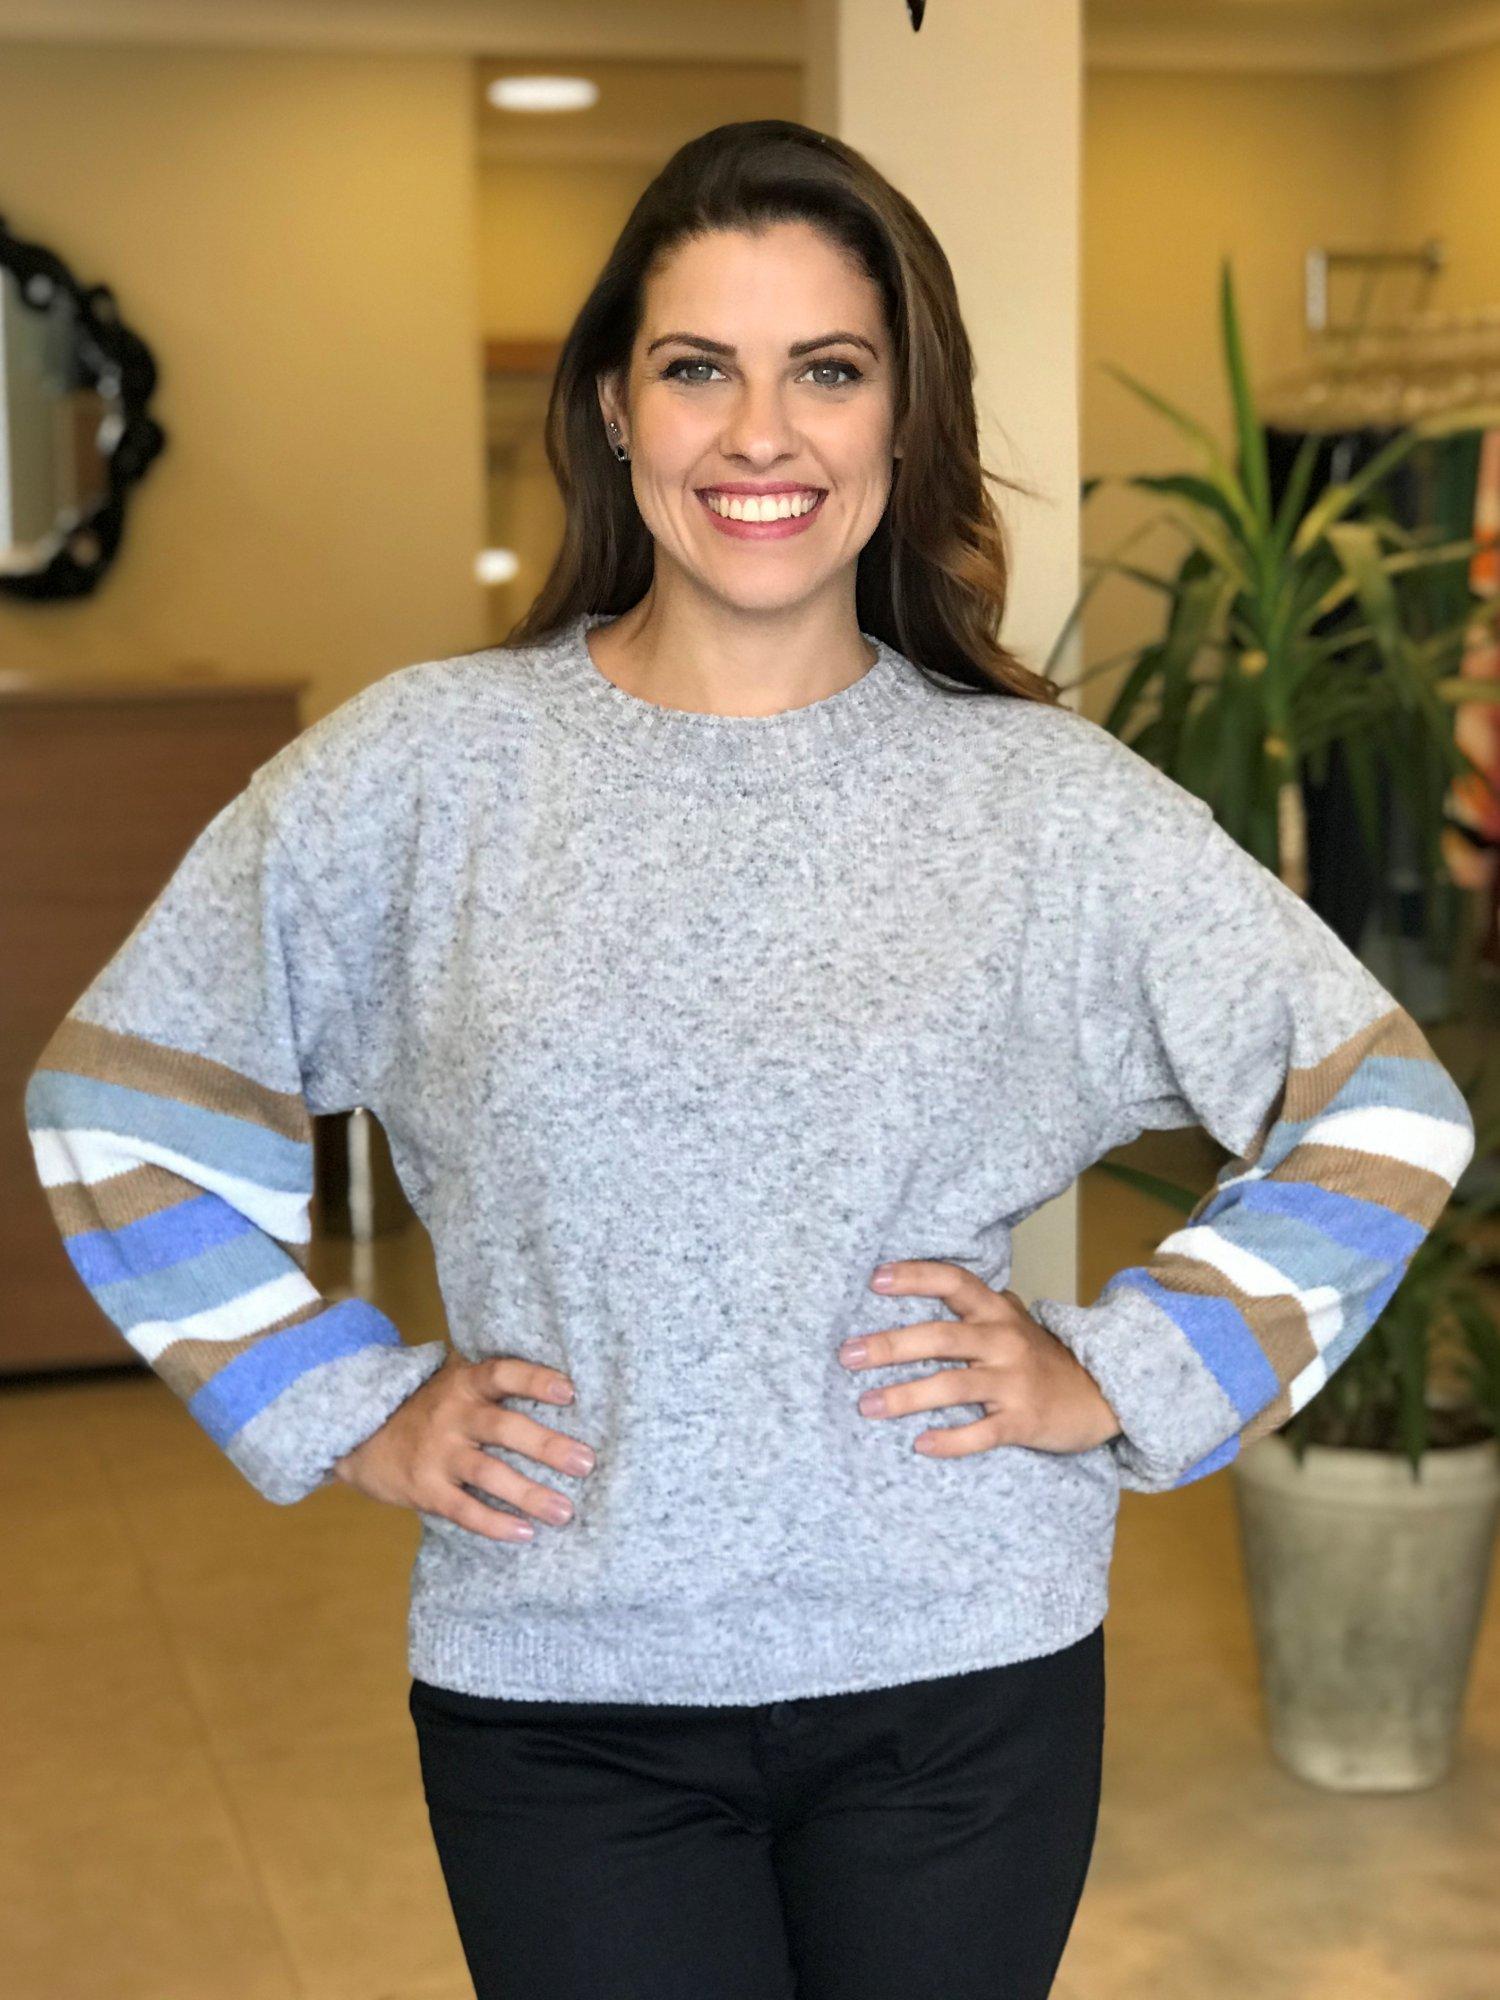 Suéter Tricot Cinza Listras nas Mangas